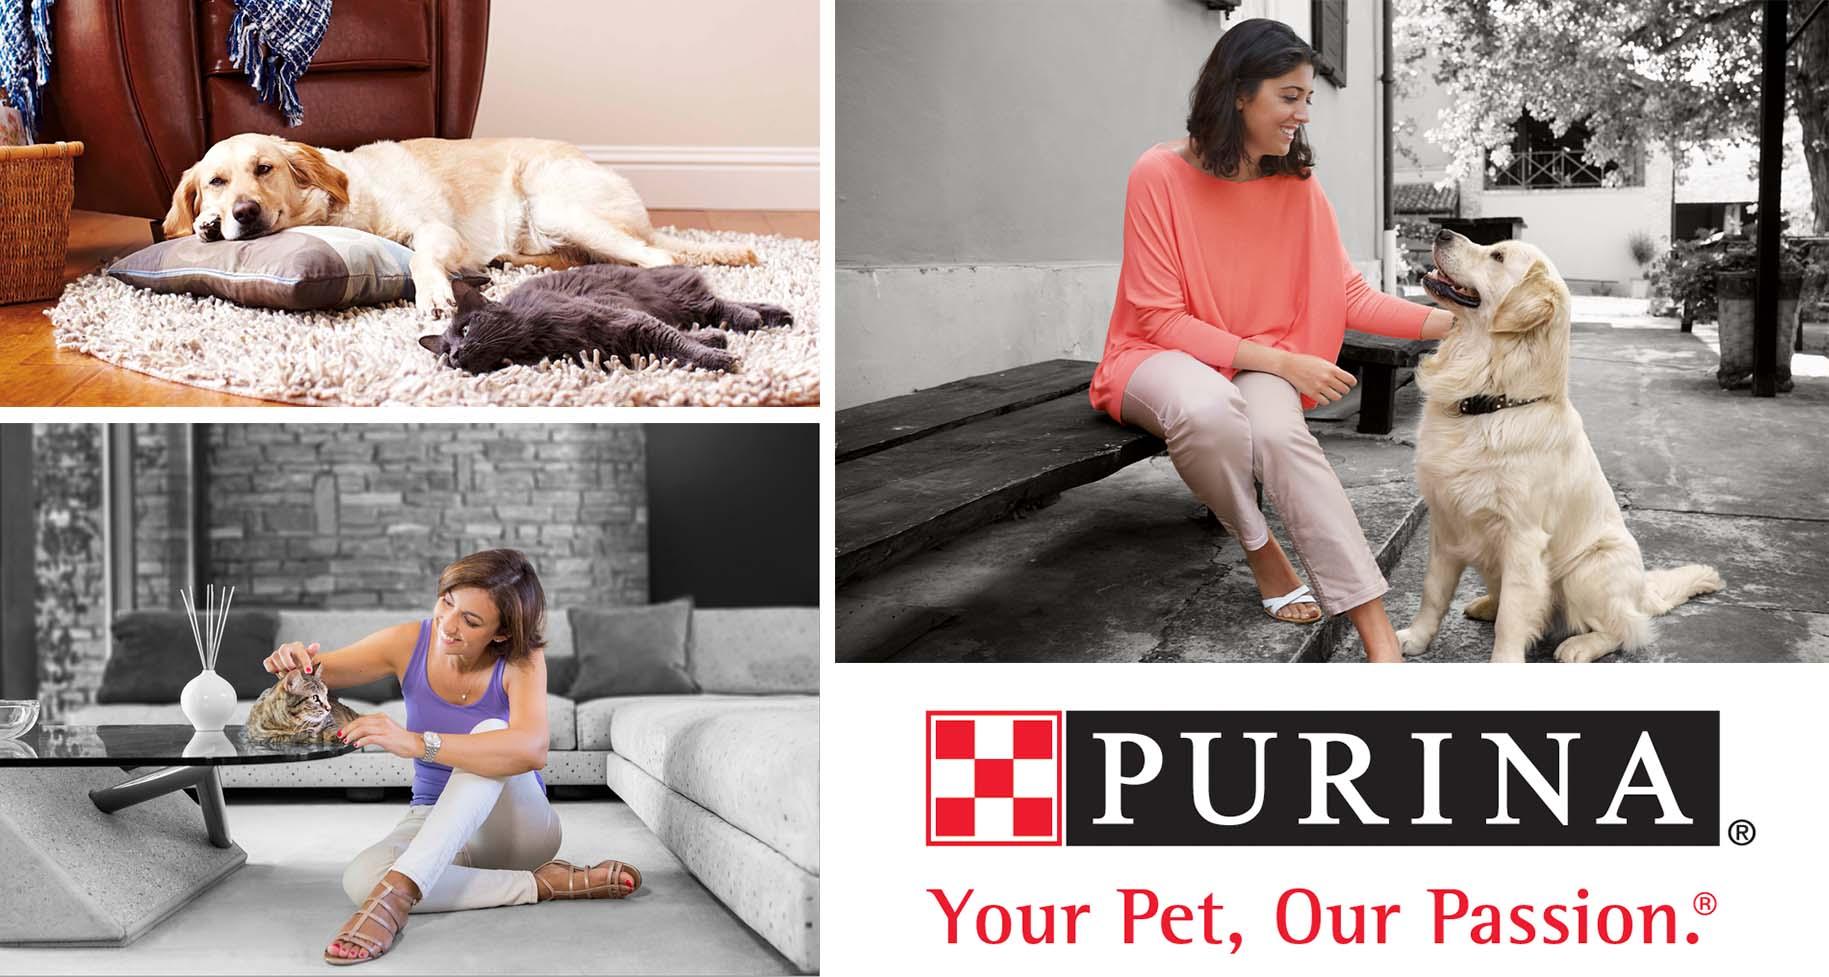 purina-sponsorship